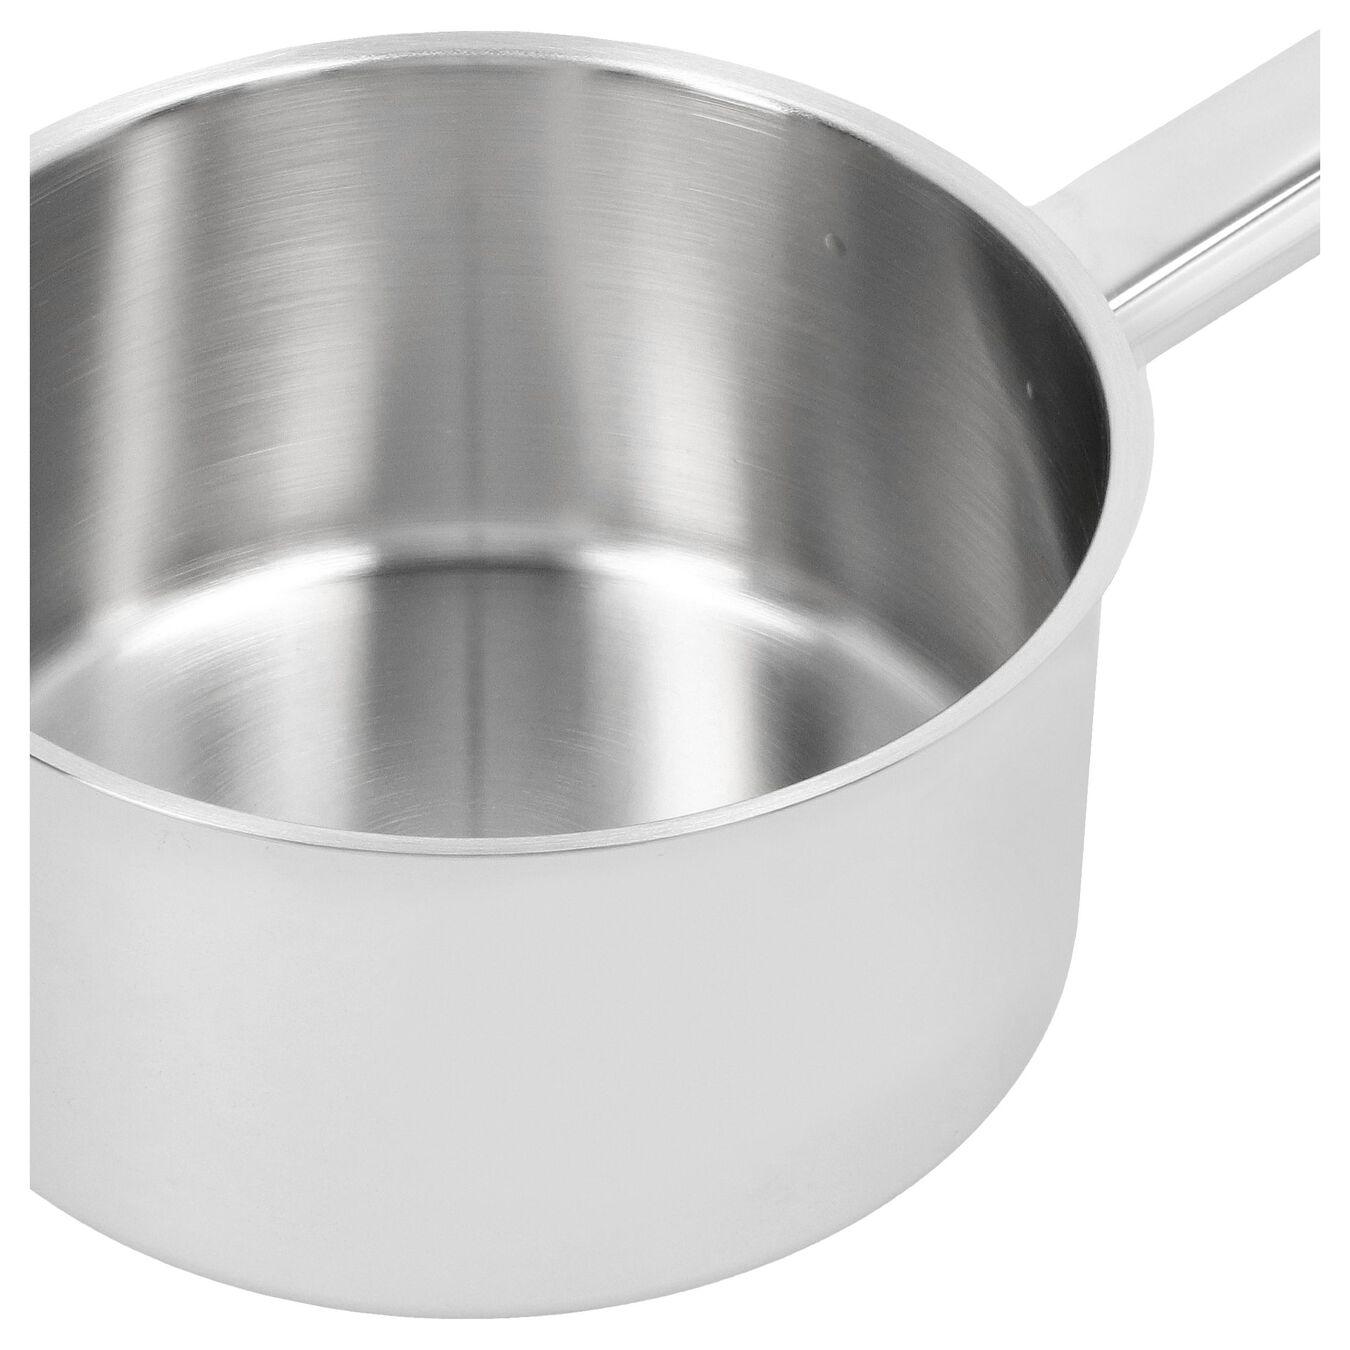 Steelpan zonder deksel 14 cm / 1 l,,large 3